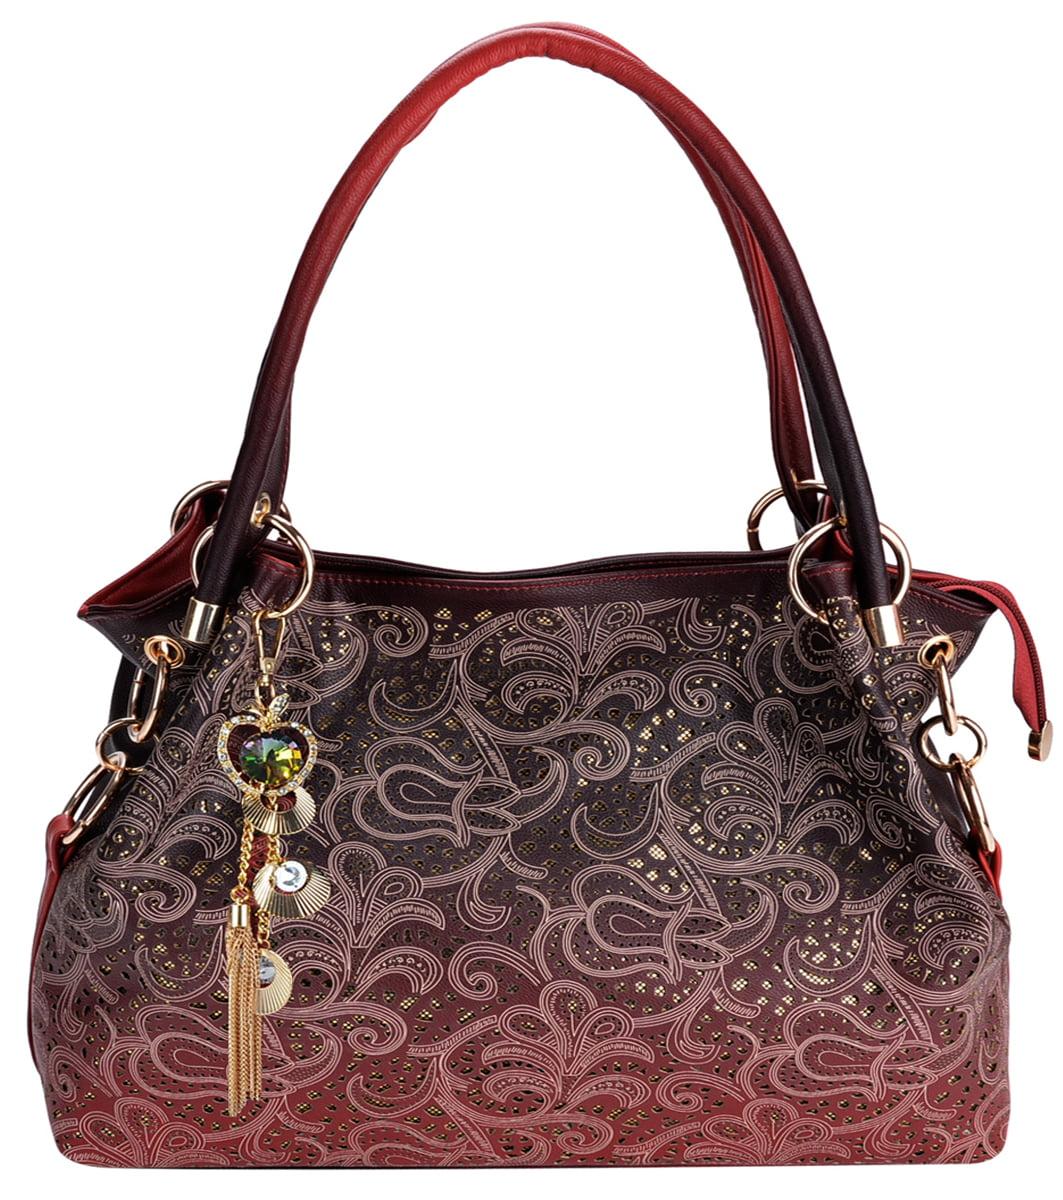 Handbags for Women, Tinksky Faux Leather Purse Ladies Handbag Vintage Designer Handbags...